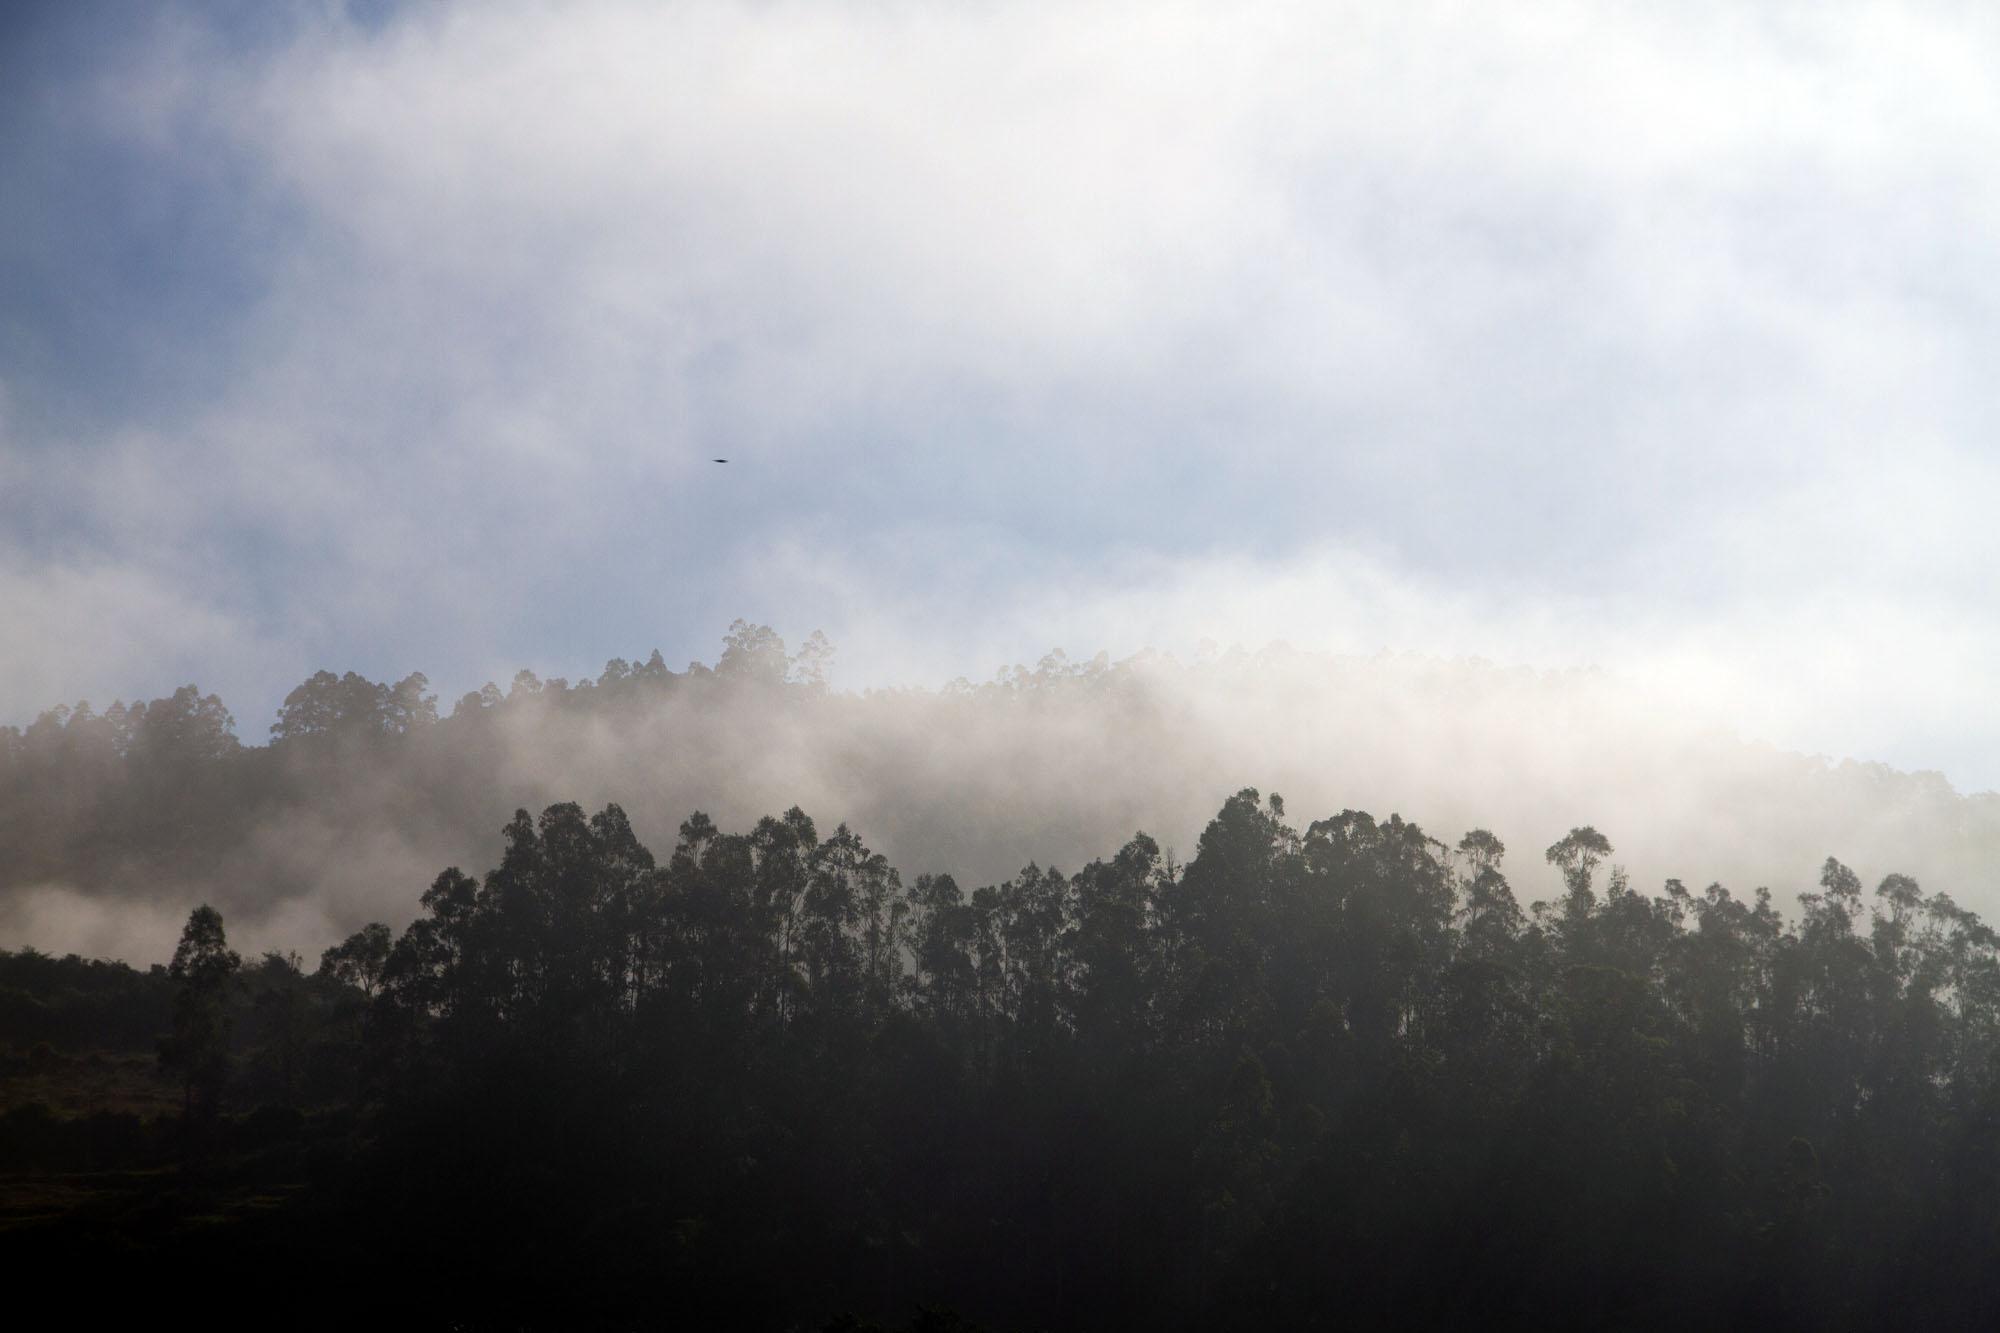 Mist over Asturias